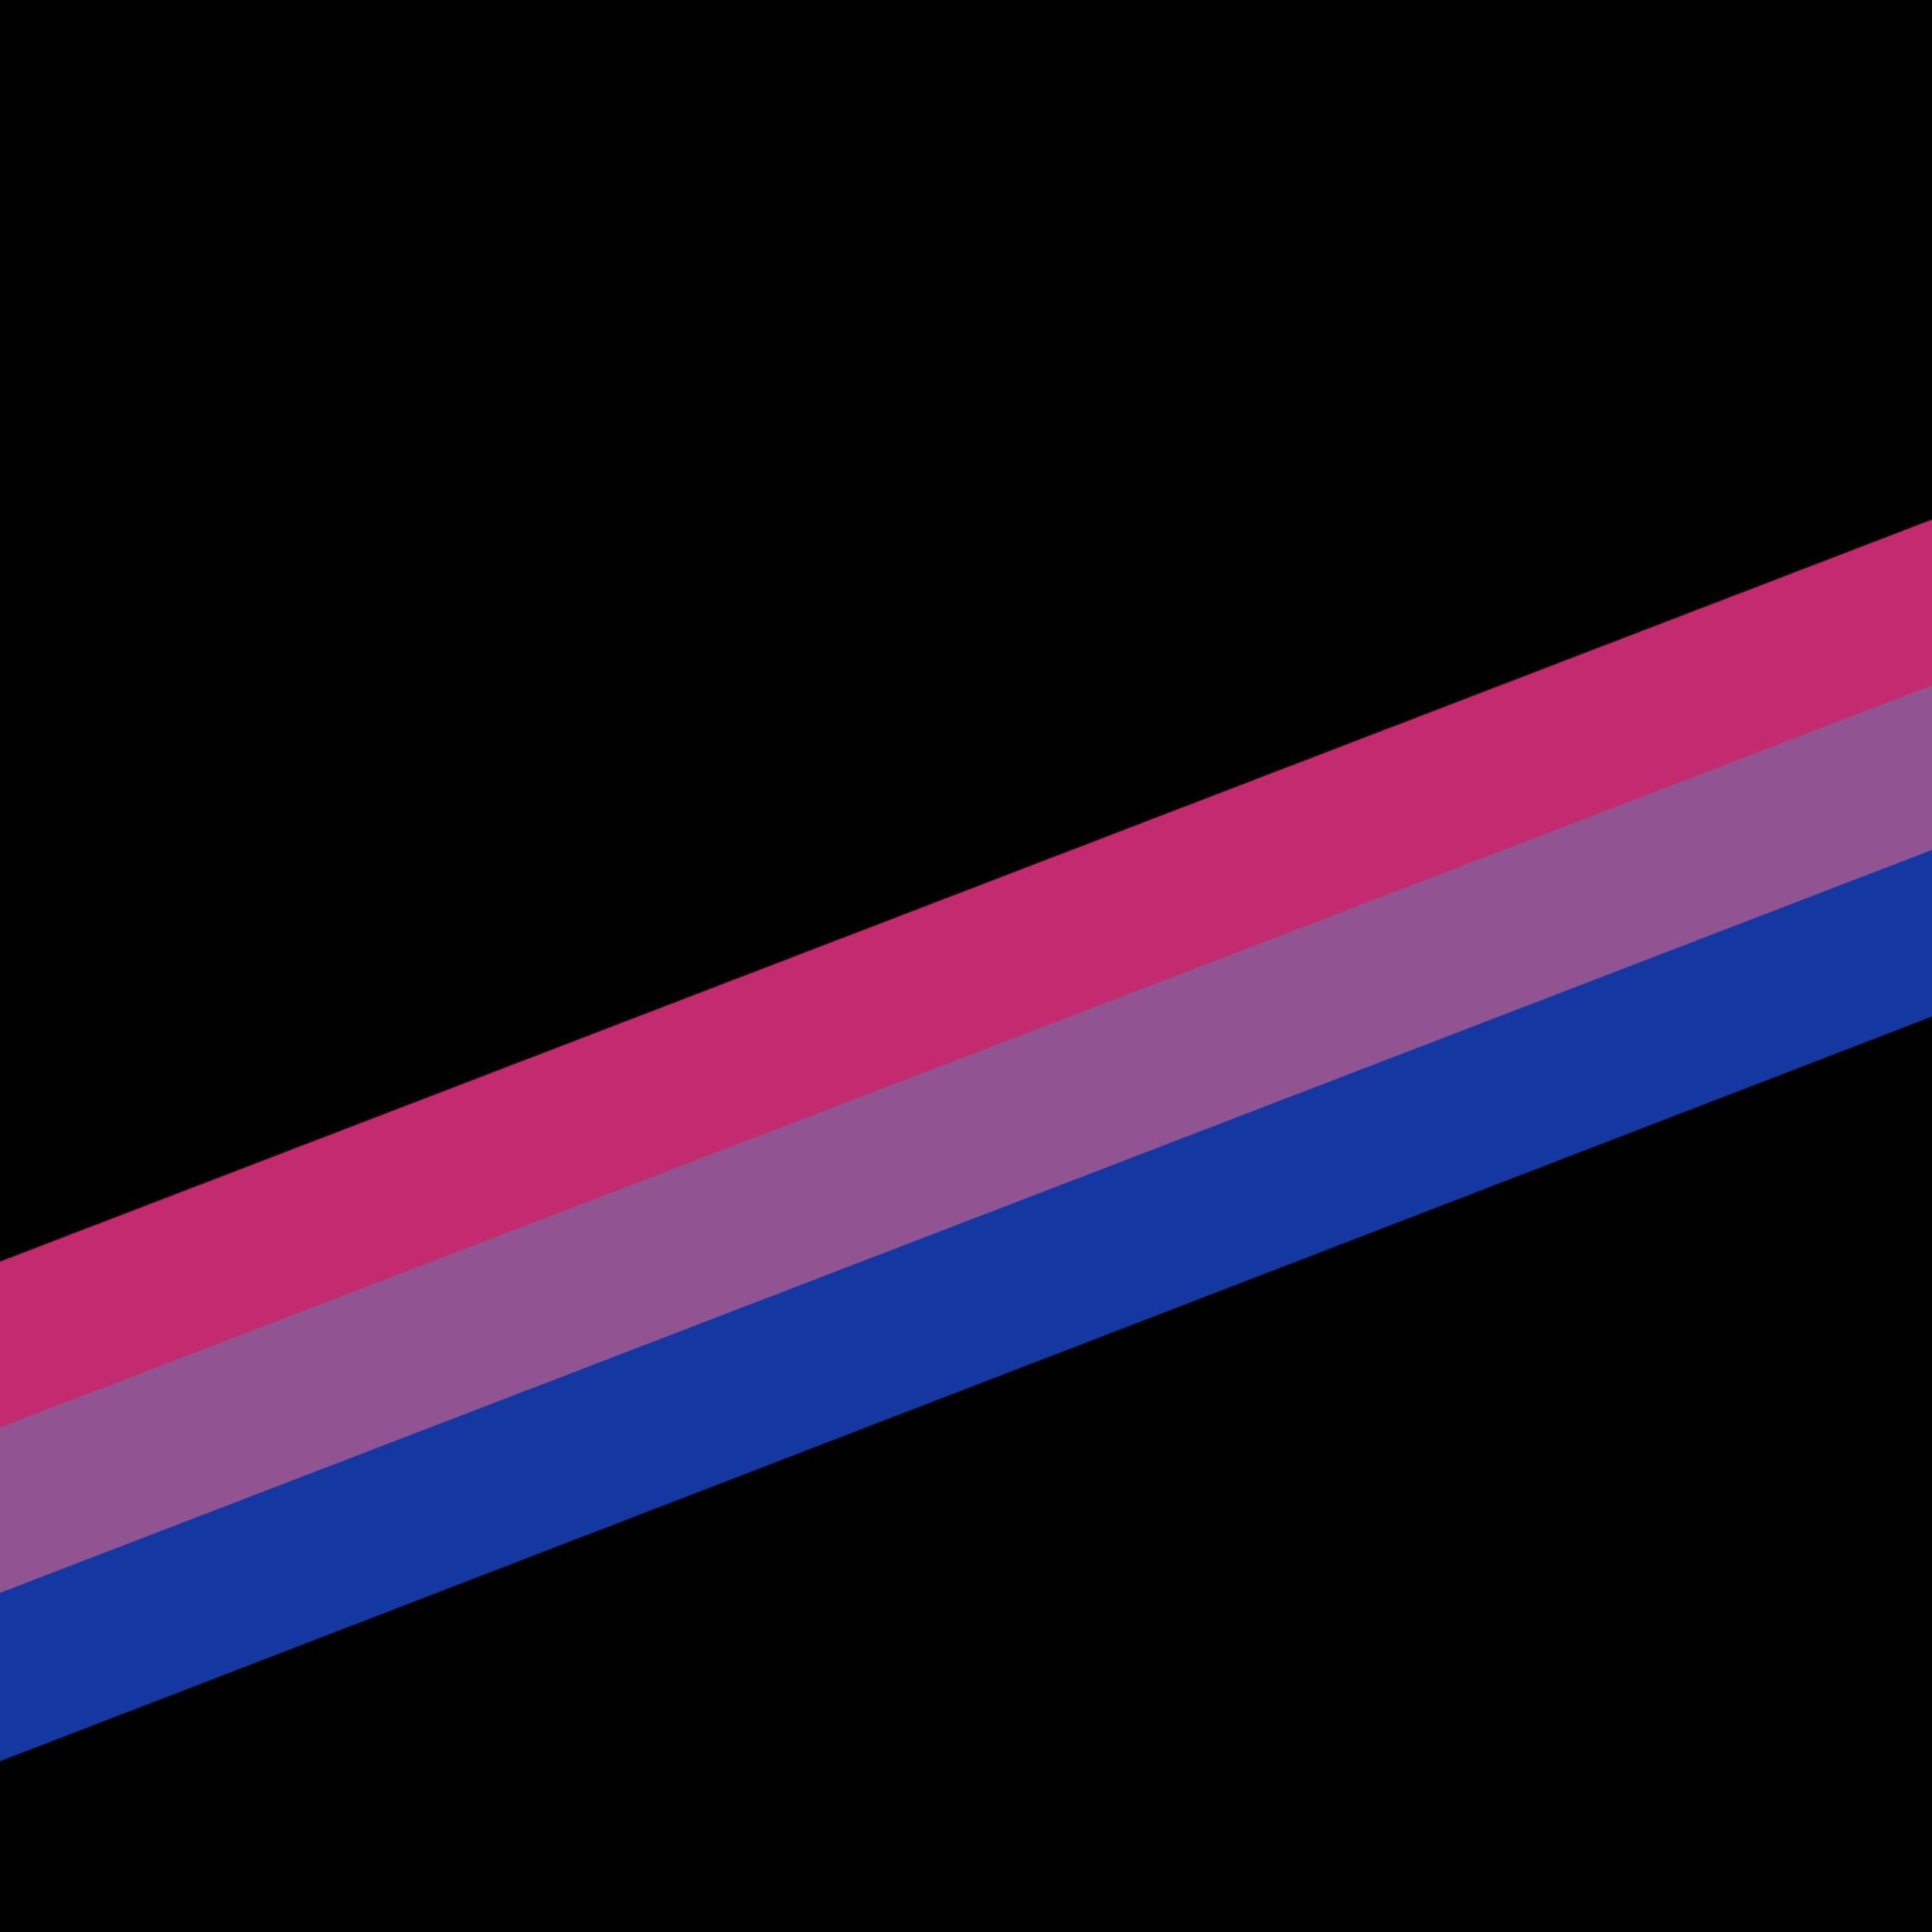 Bi-Sexual Flag Wallpaper design Makes Your Bathroom's New Again